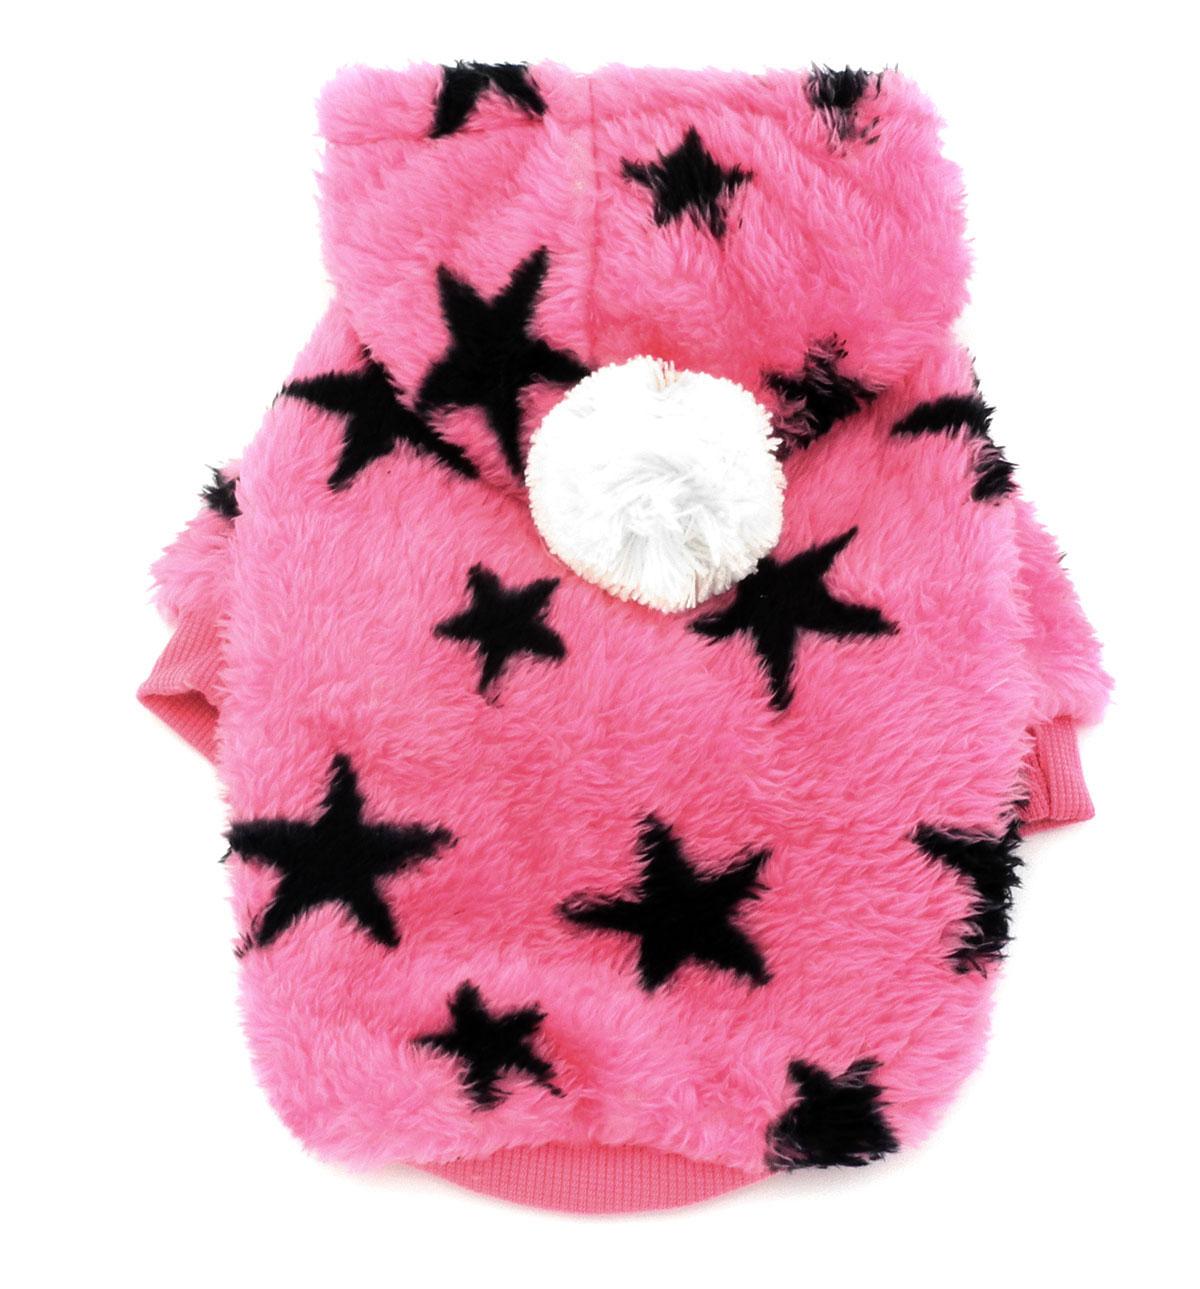 Small Dog Coat Pattern Stars Fleece Dog Sweaters Puppy Hoodies Warm Cat Pet Clothes Winter Dog Sweatshirts